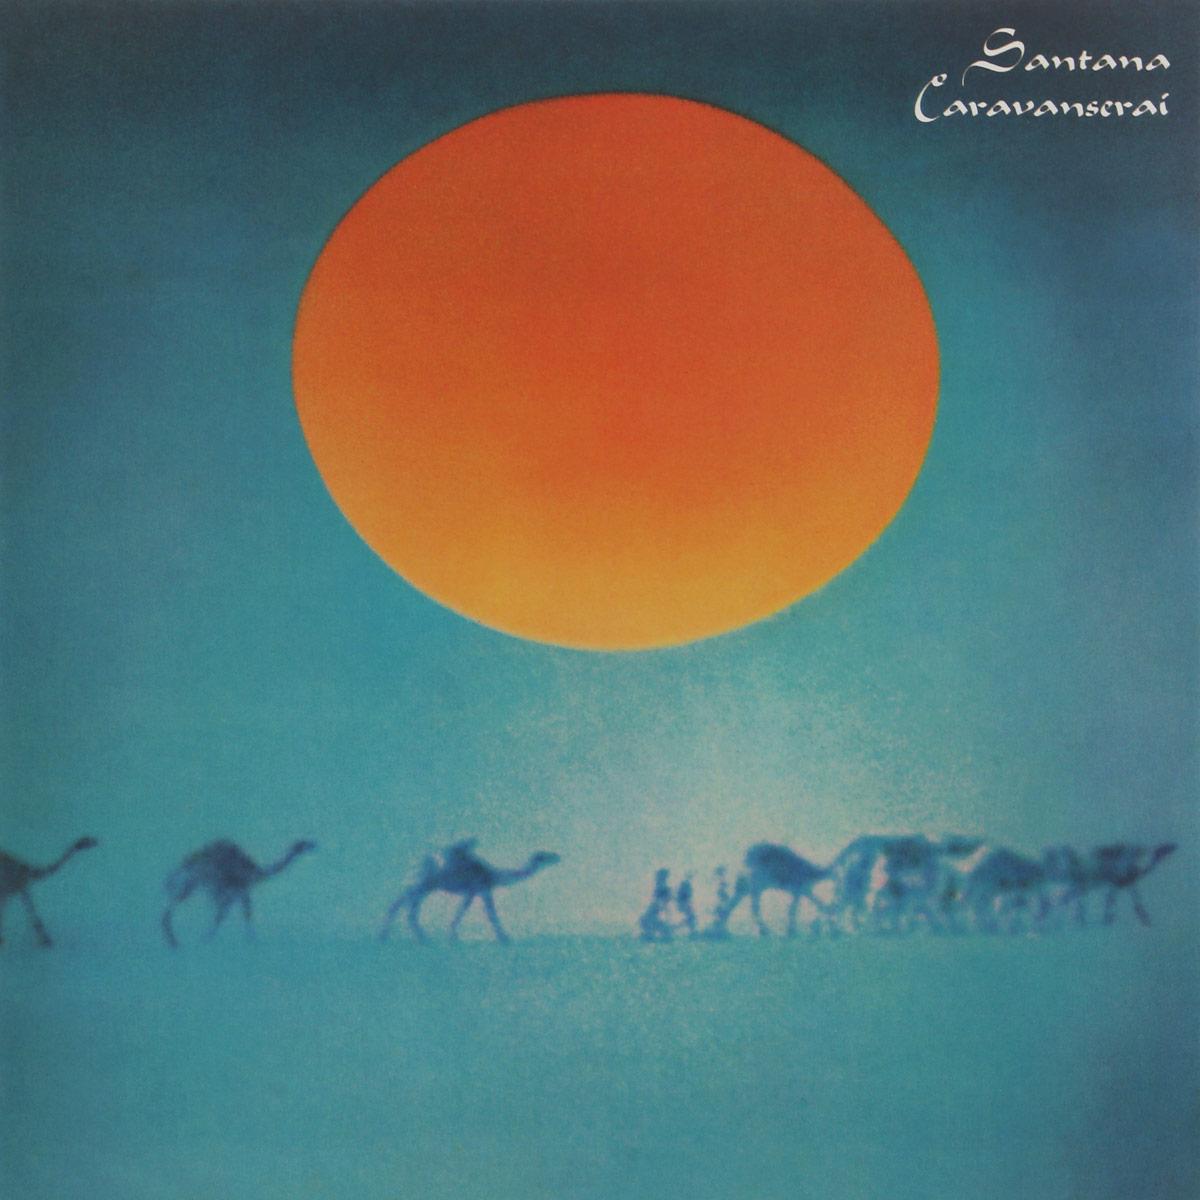 цена на Santana Santana. Caravanserai (LP)